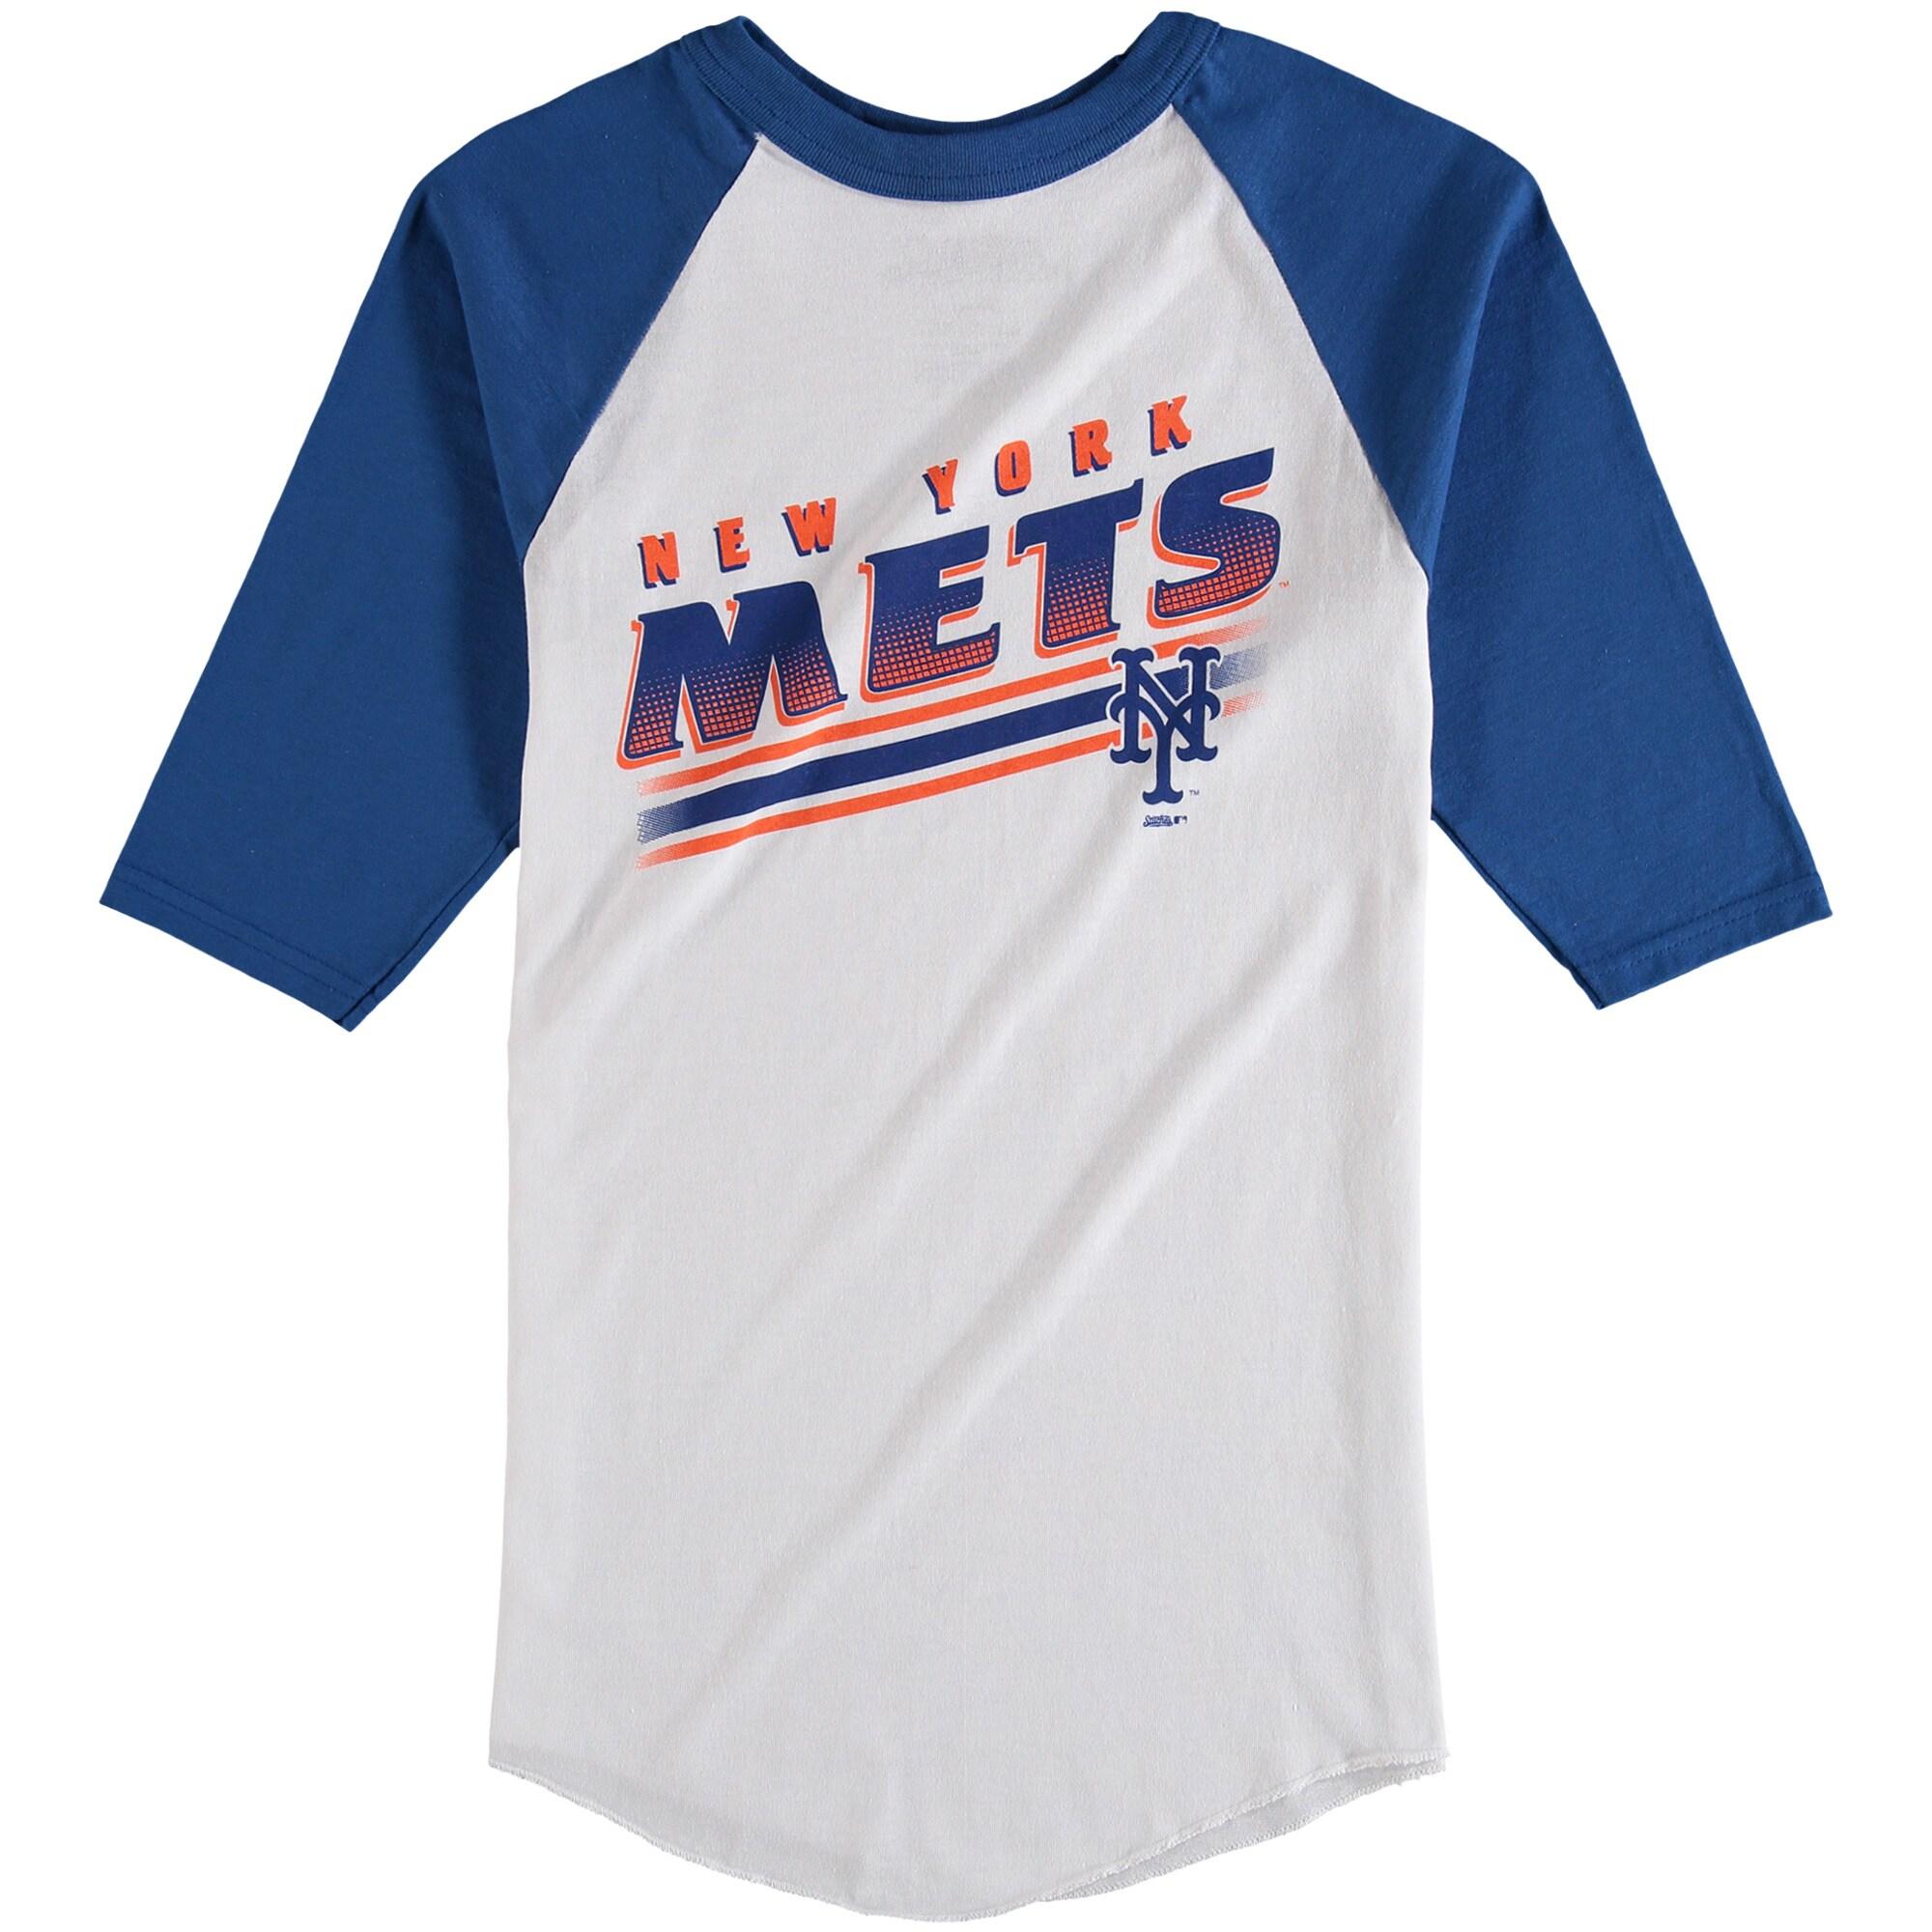 New York Mets Stitches Youth 3/4-Sleeve Raglan T-Shirt - White/Royal